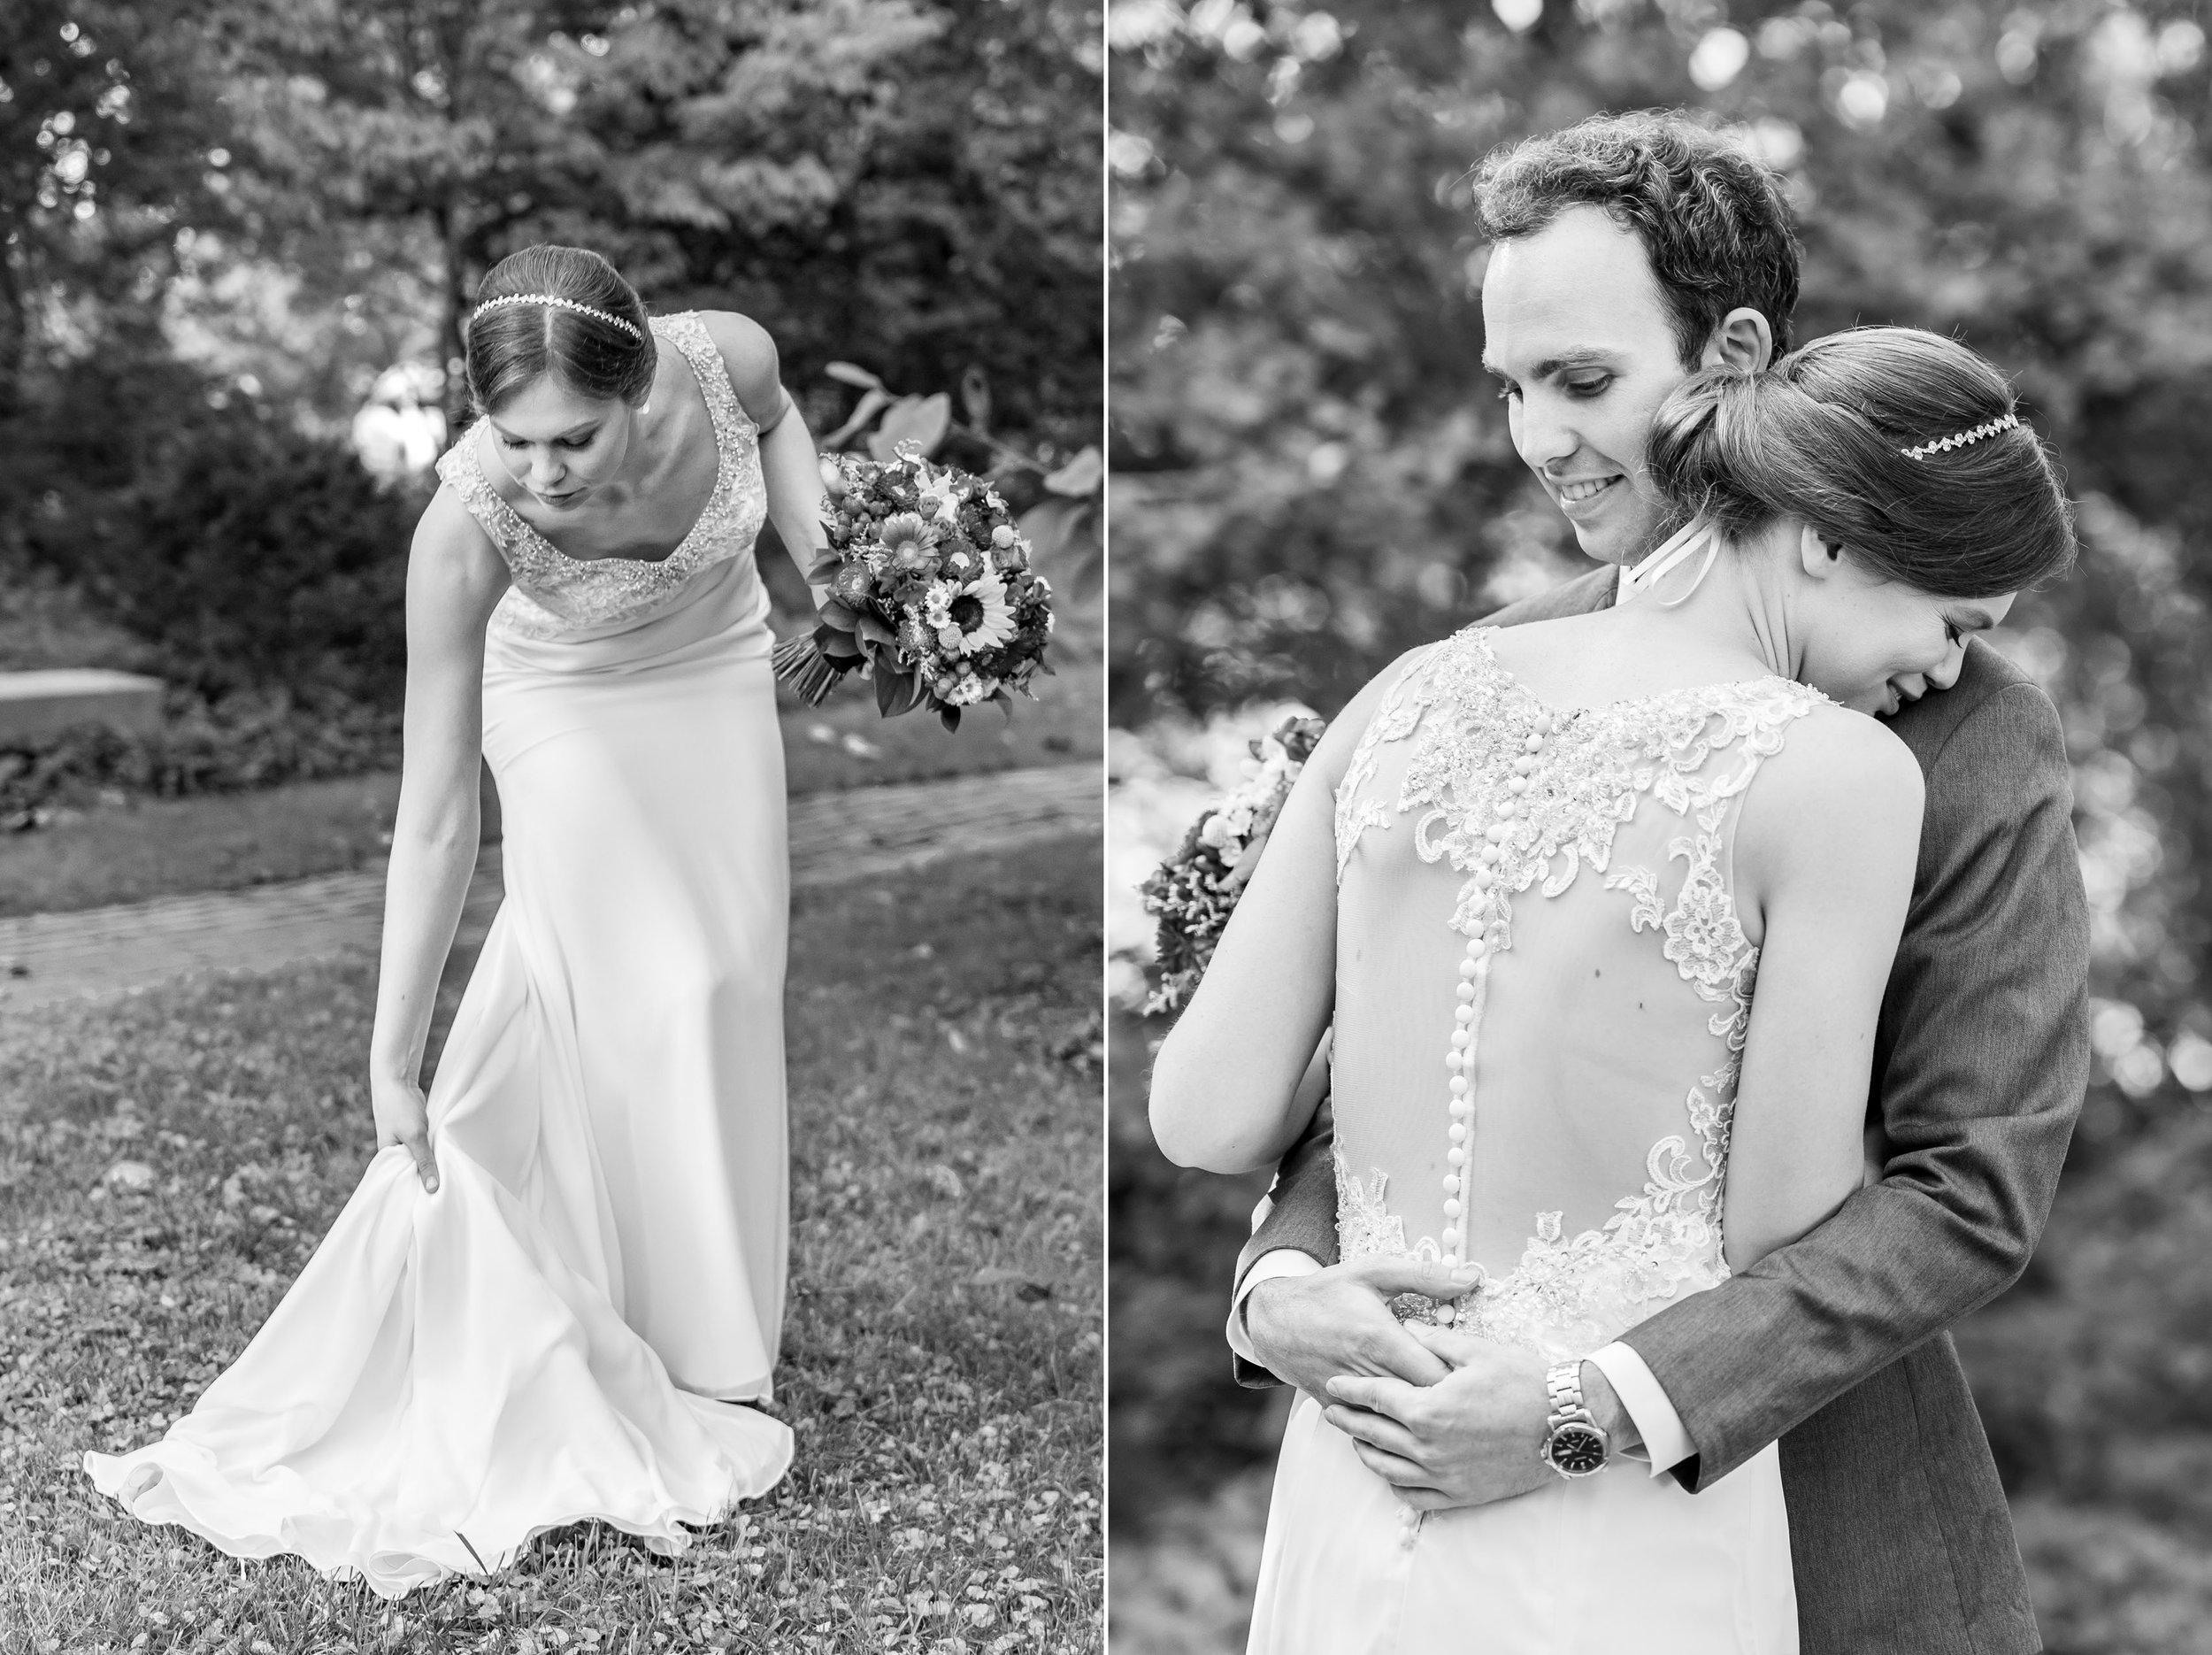 Bride wearing Morilee Myka at Elkridge Furnace Inn wedding in September